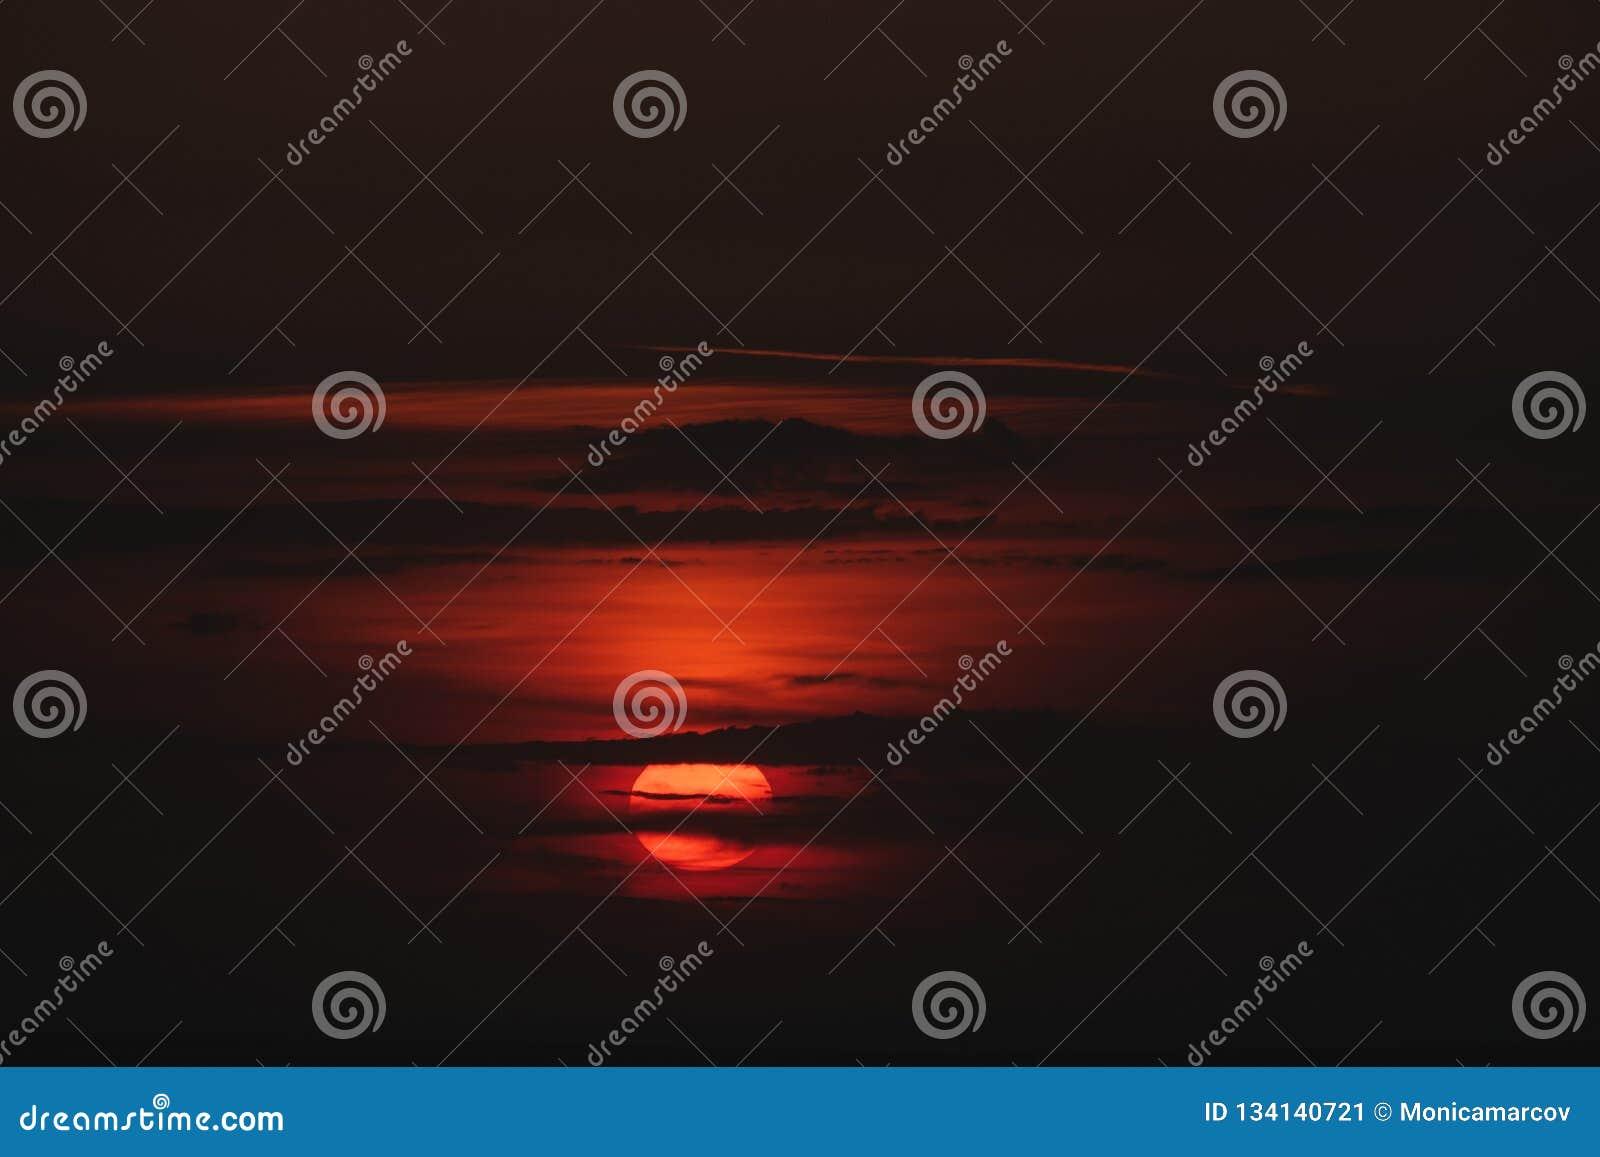 summer Cloudy Orange shadow Sunset